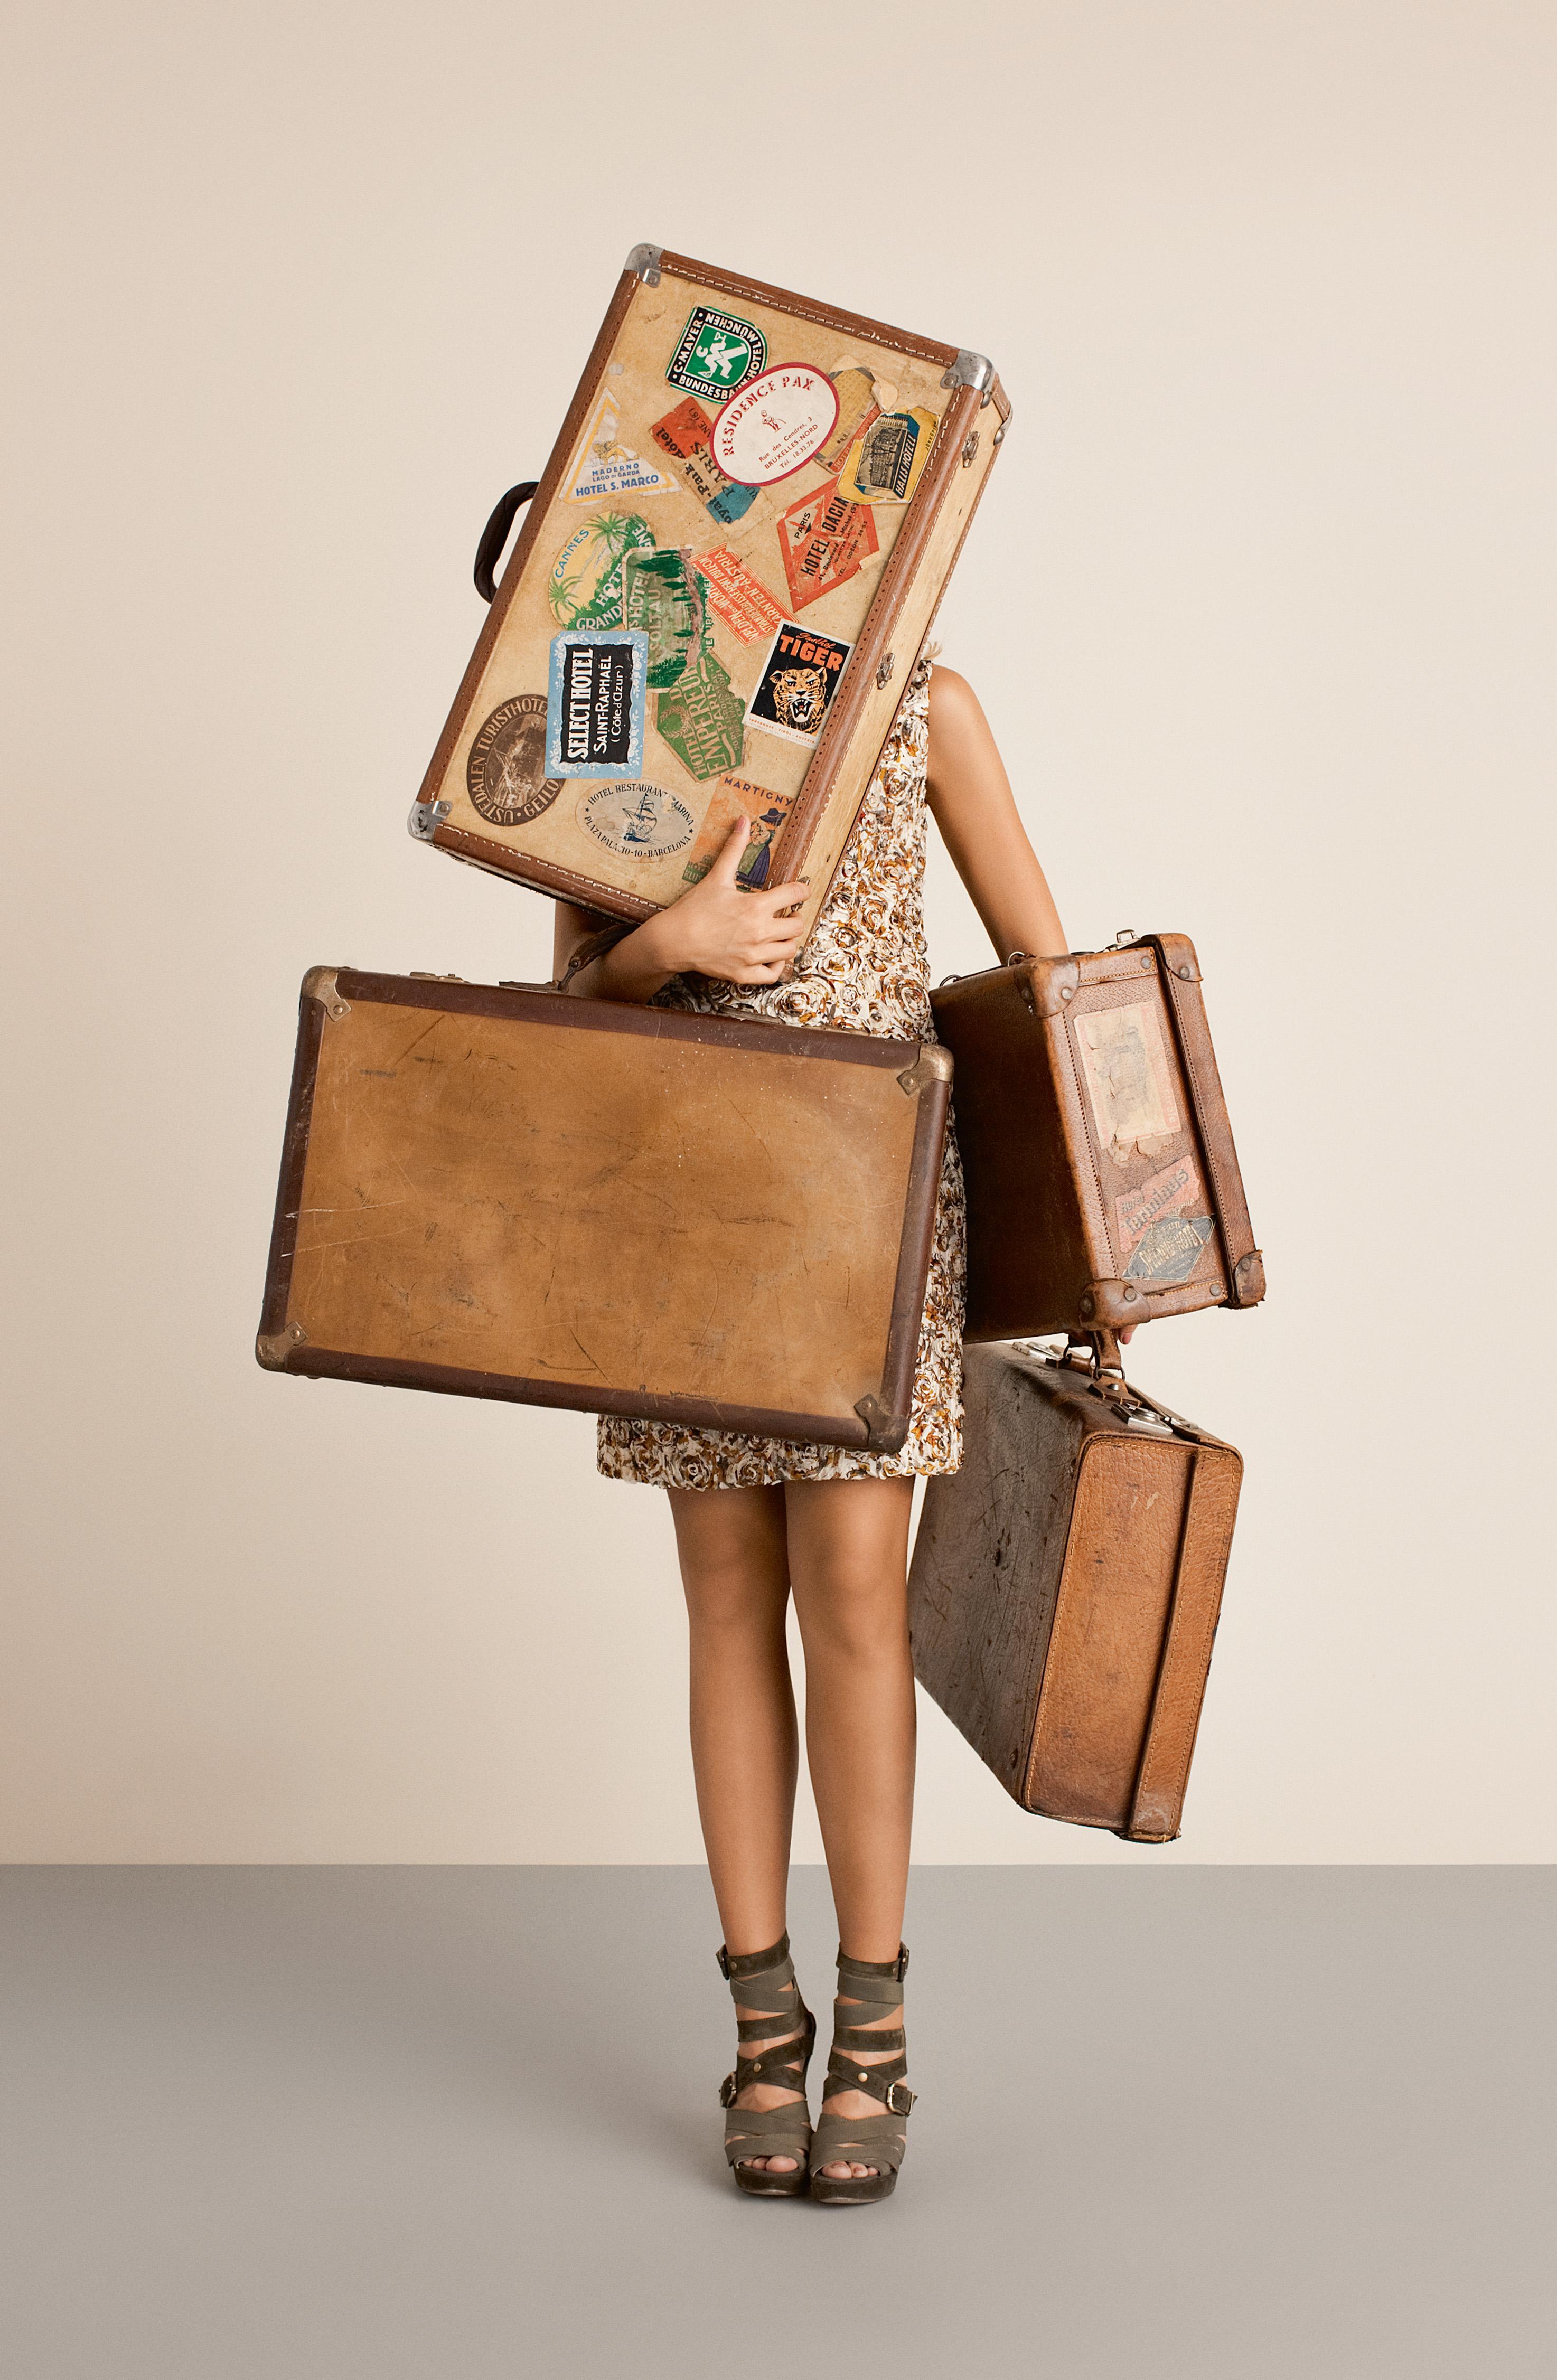 http://gizmolina.com/wp-content/uploads/2011/02/Suitcase-girl.jpg